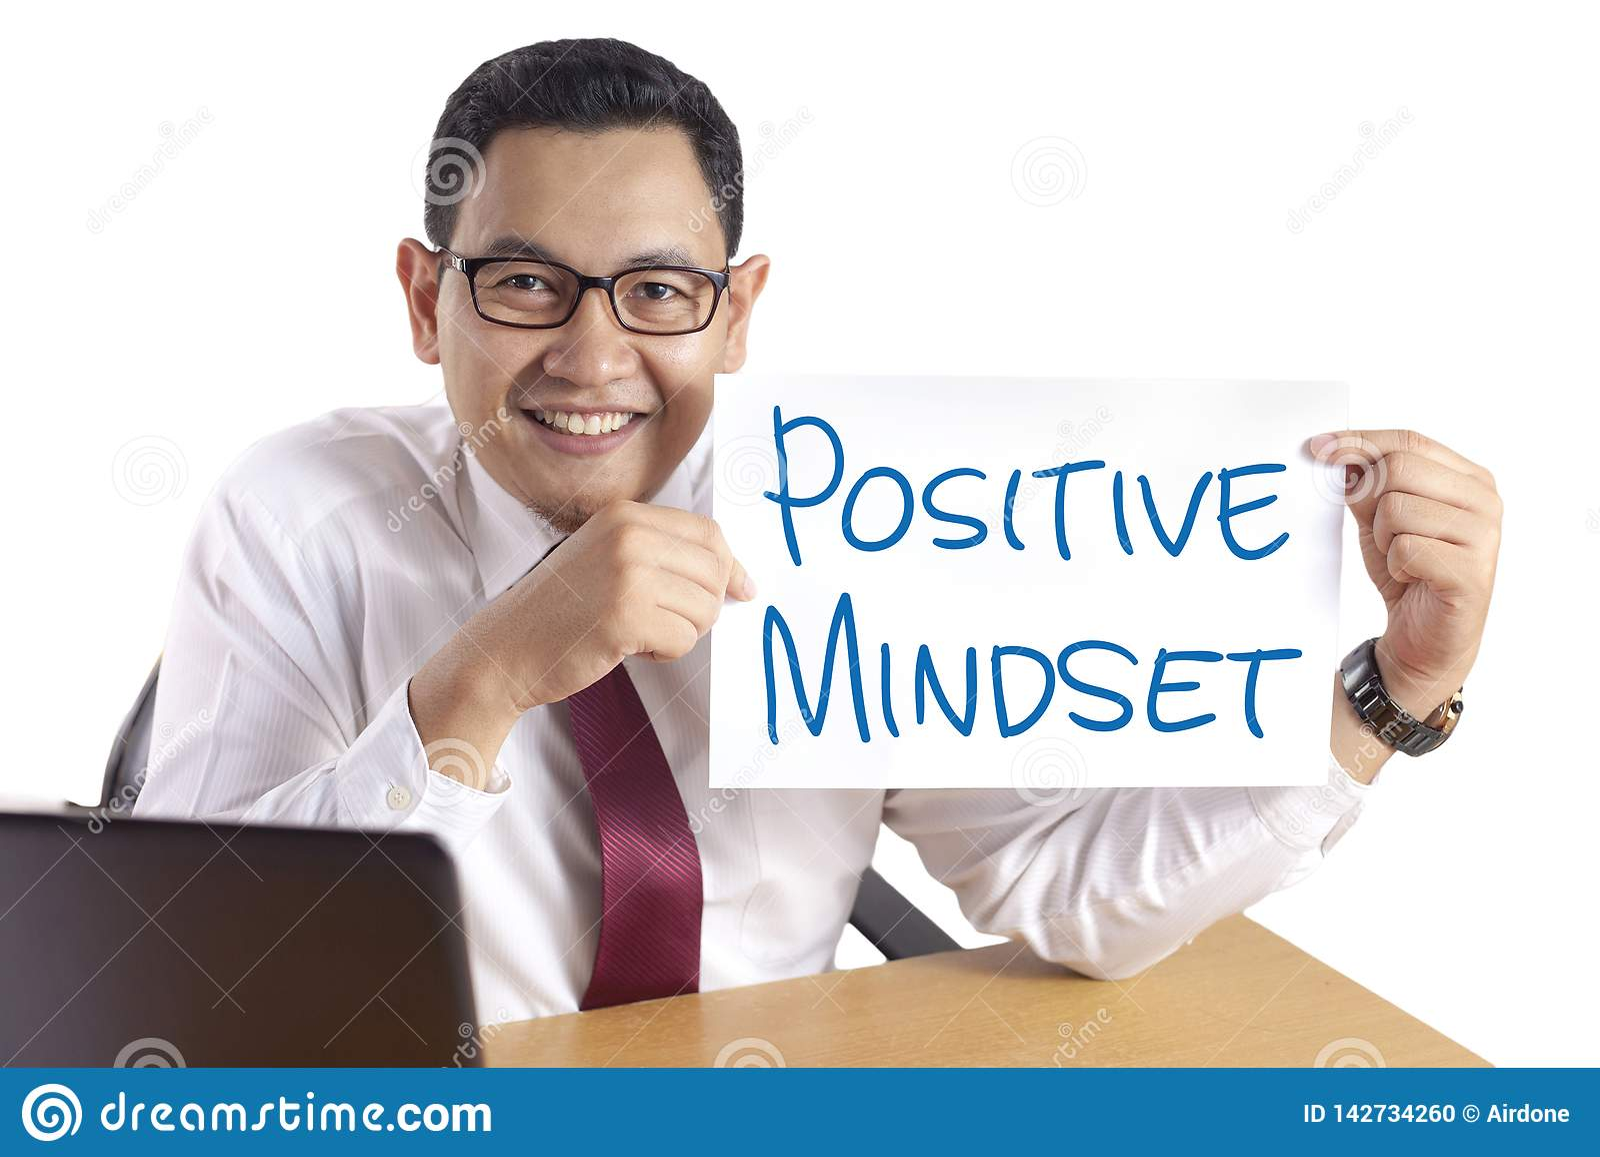 Positive Denkrichtung, Motivwort-Zitat-Konzept